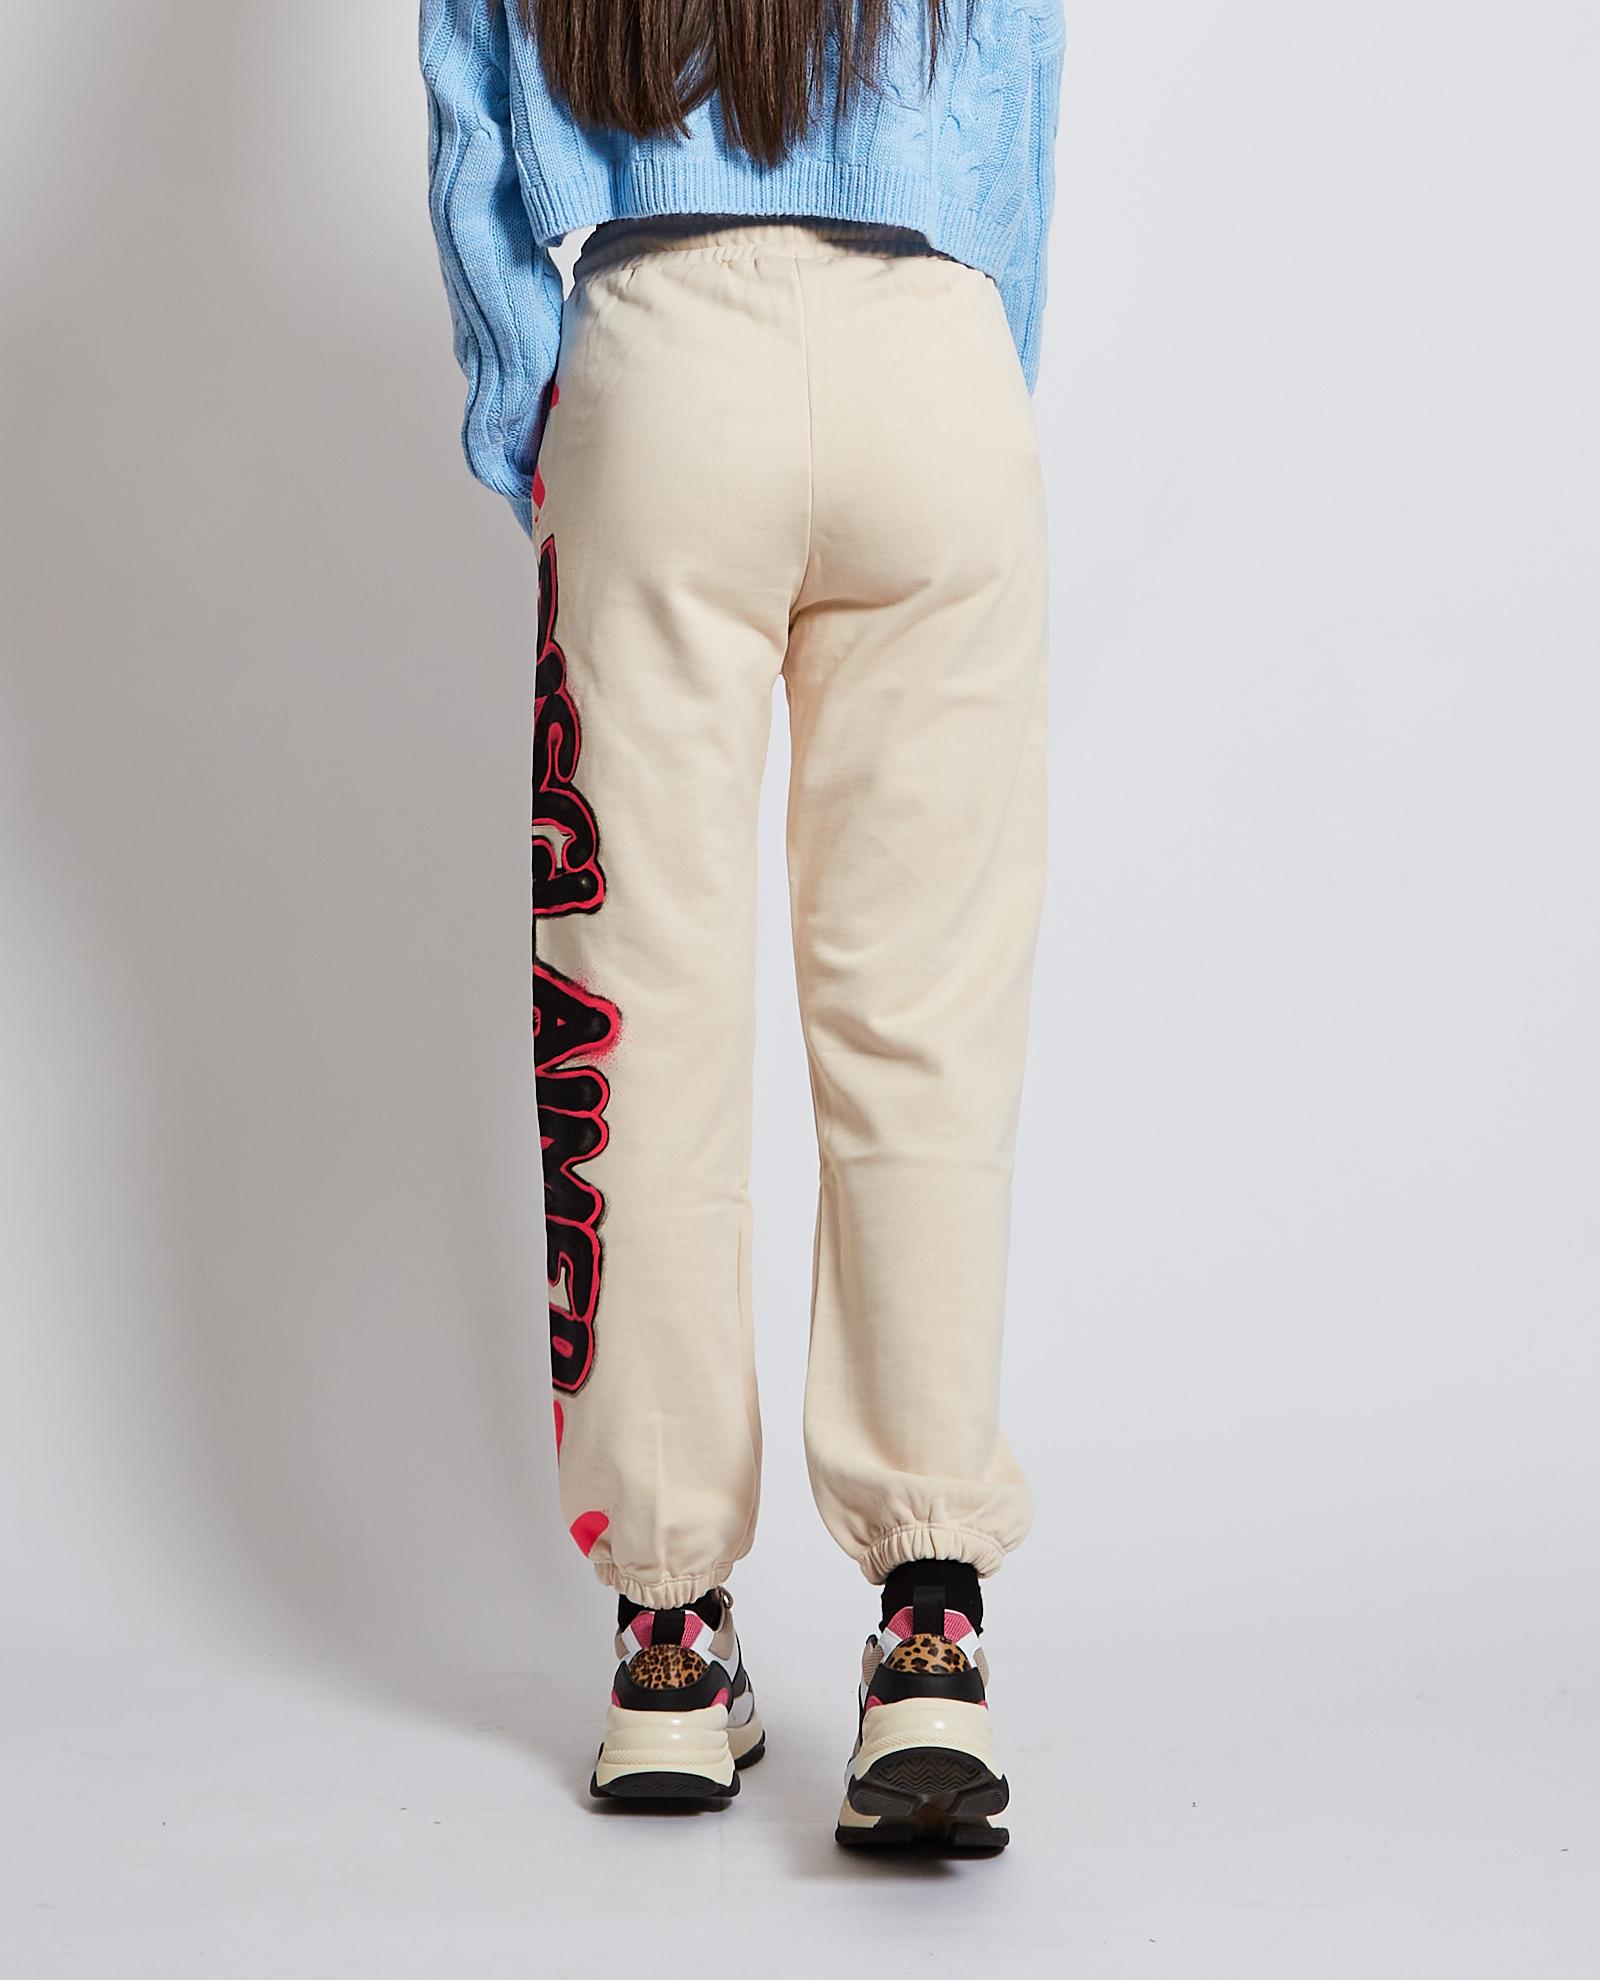 Pantalone tuta DISCLAIMER | Pantalone | DS50942OFF WHITE